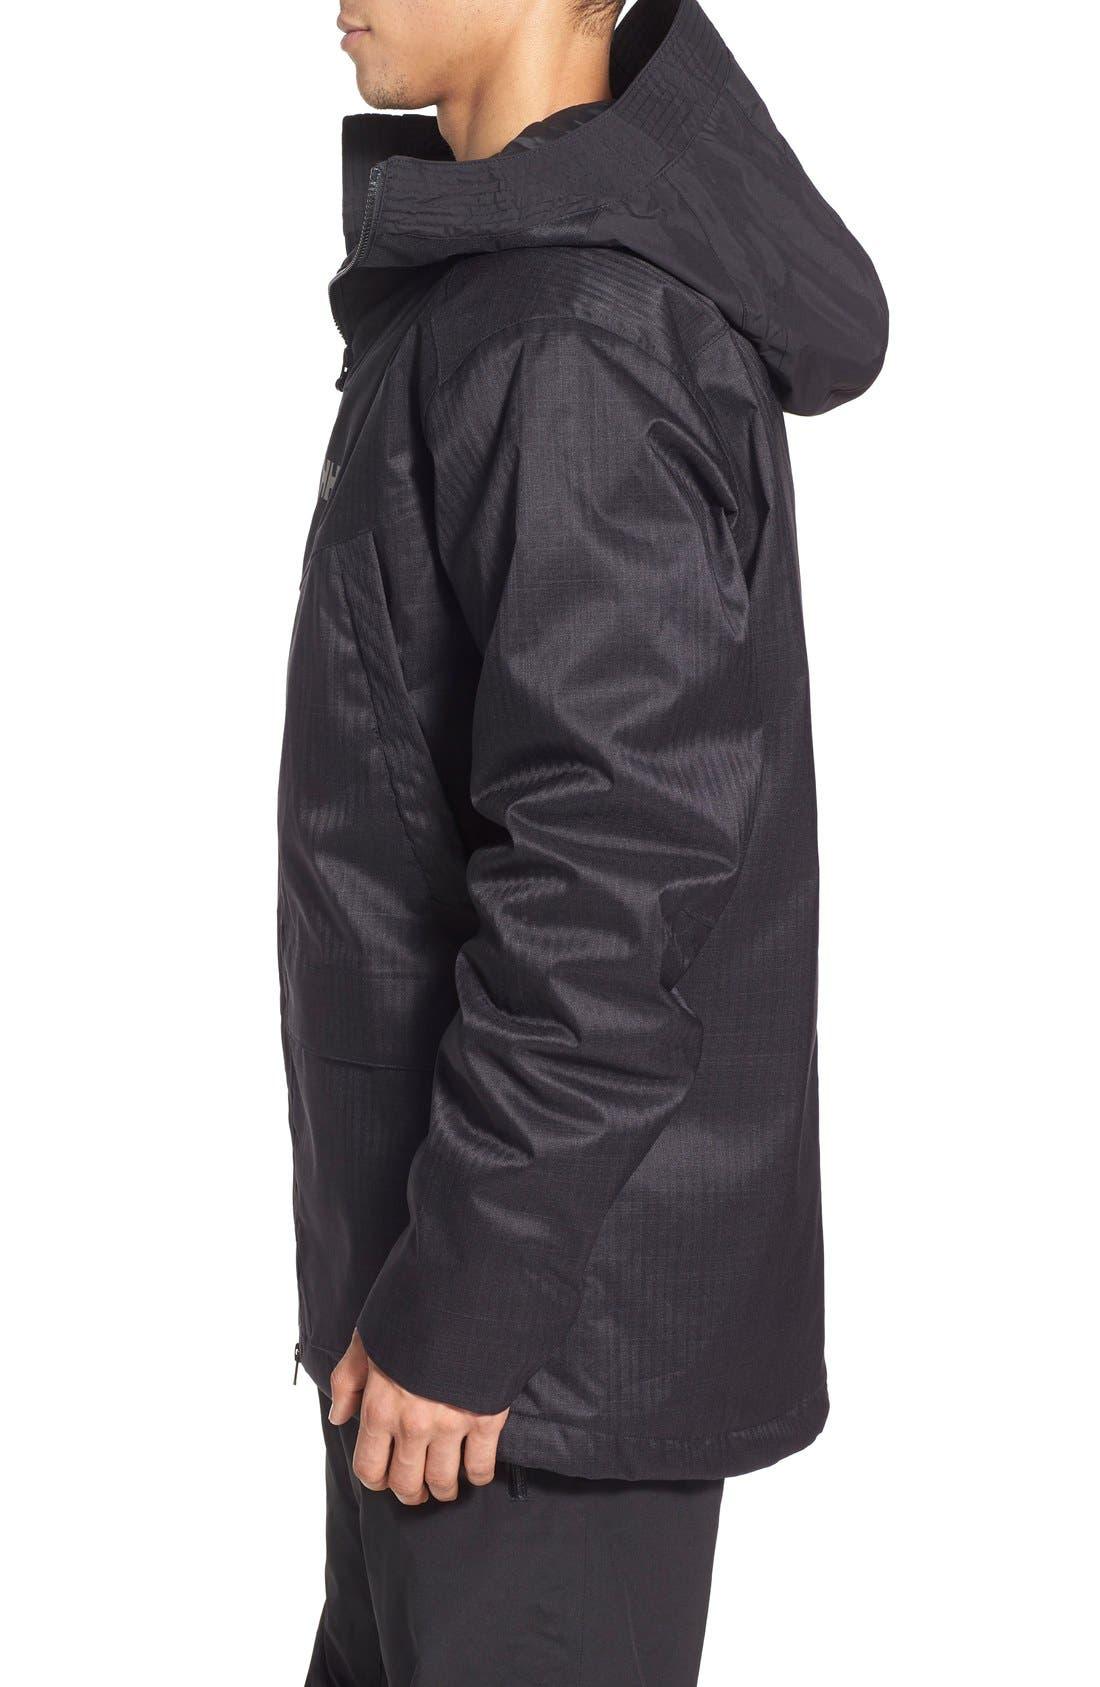 HELLY HANSEN,                             'Denver' Relaxed Fit Herringbone Hooded Jacket,                             Alternate thumbnail 2, color,                             001